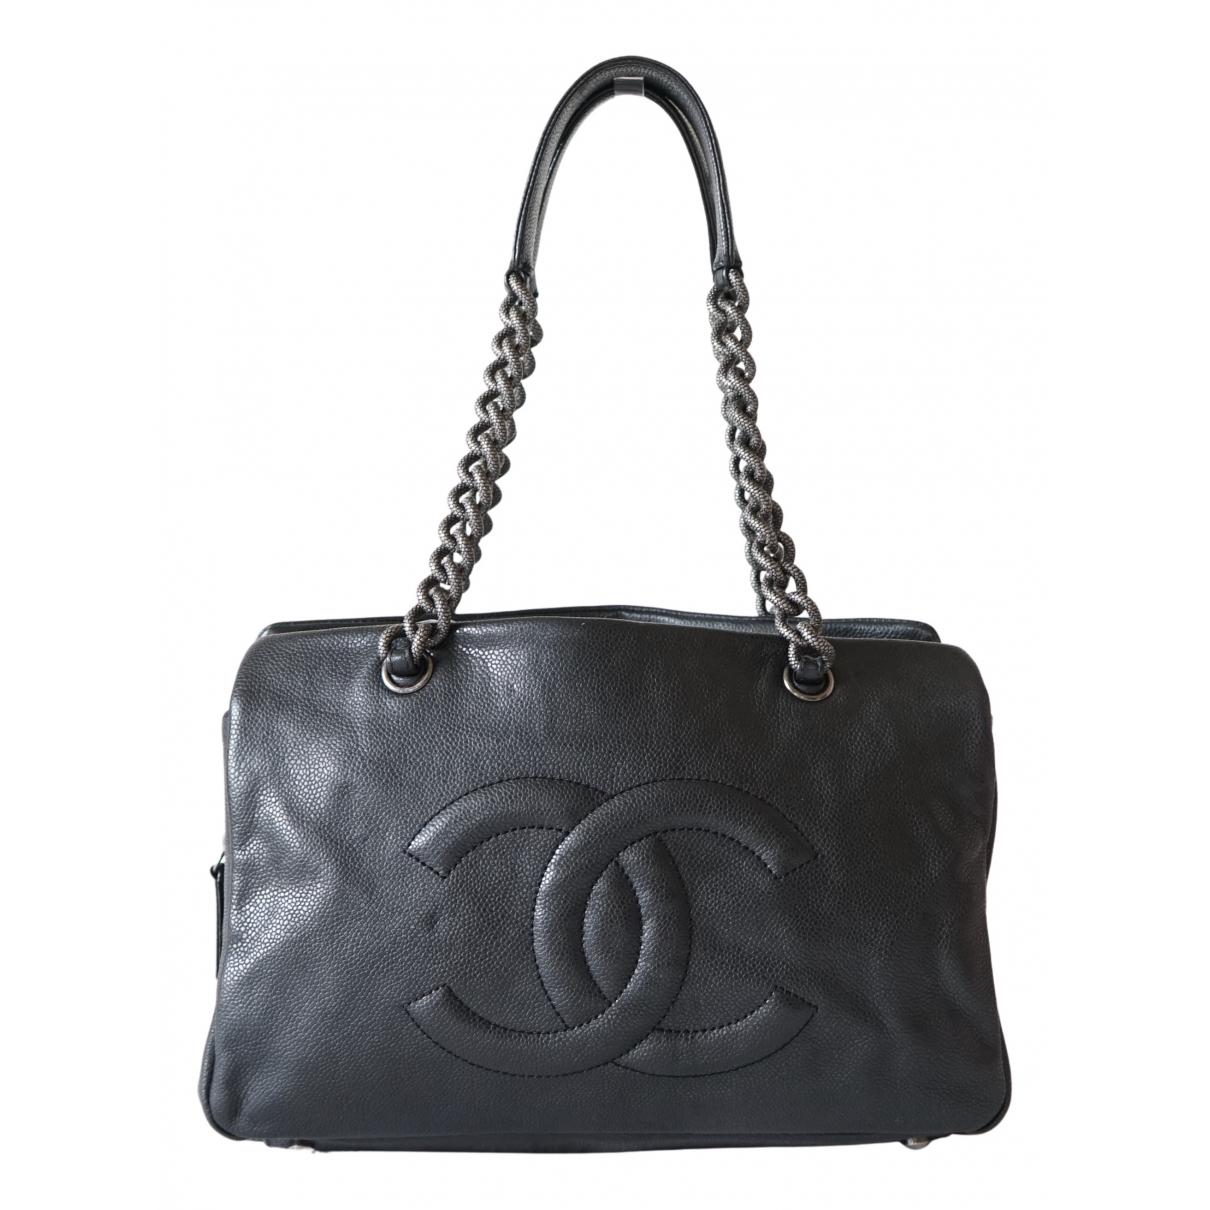 Chanel Grand shopping Handtasche in  Anthrazit Leder